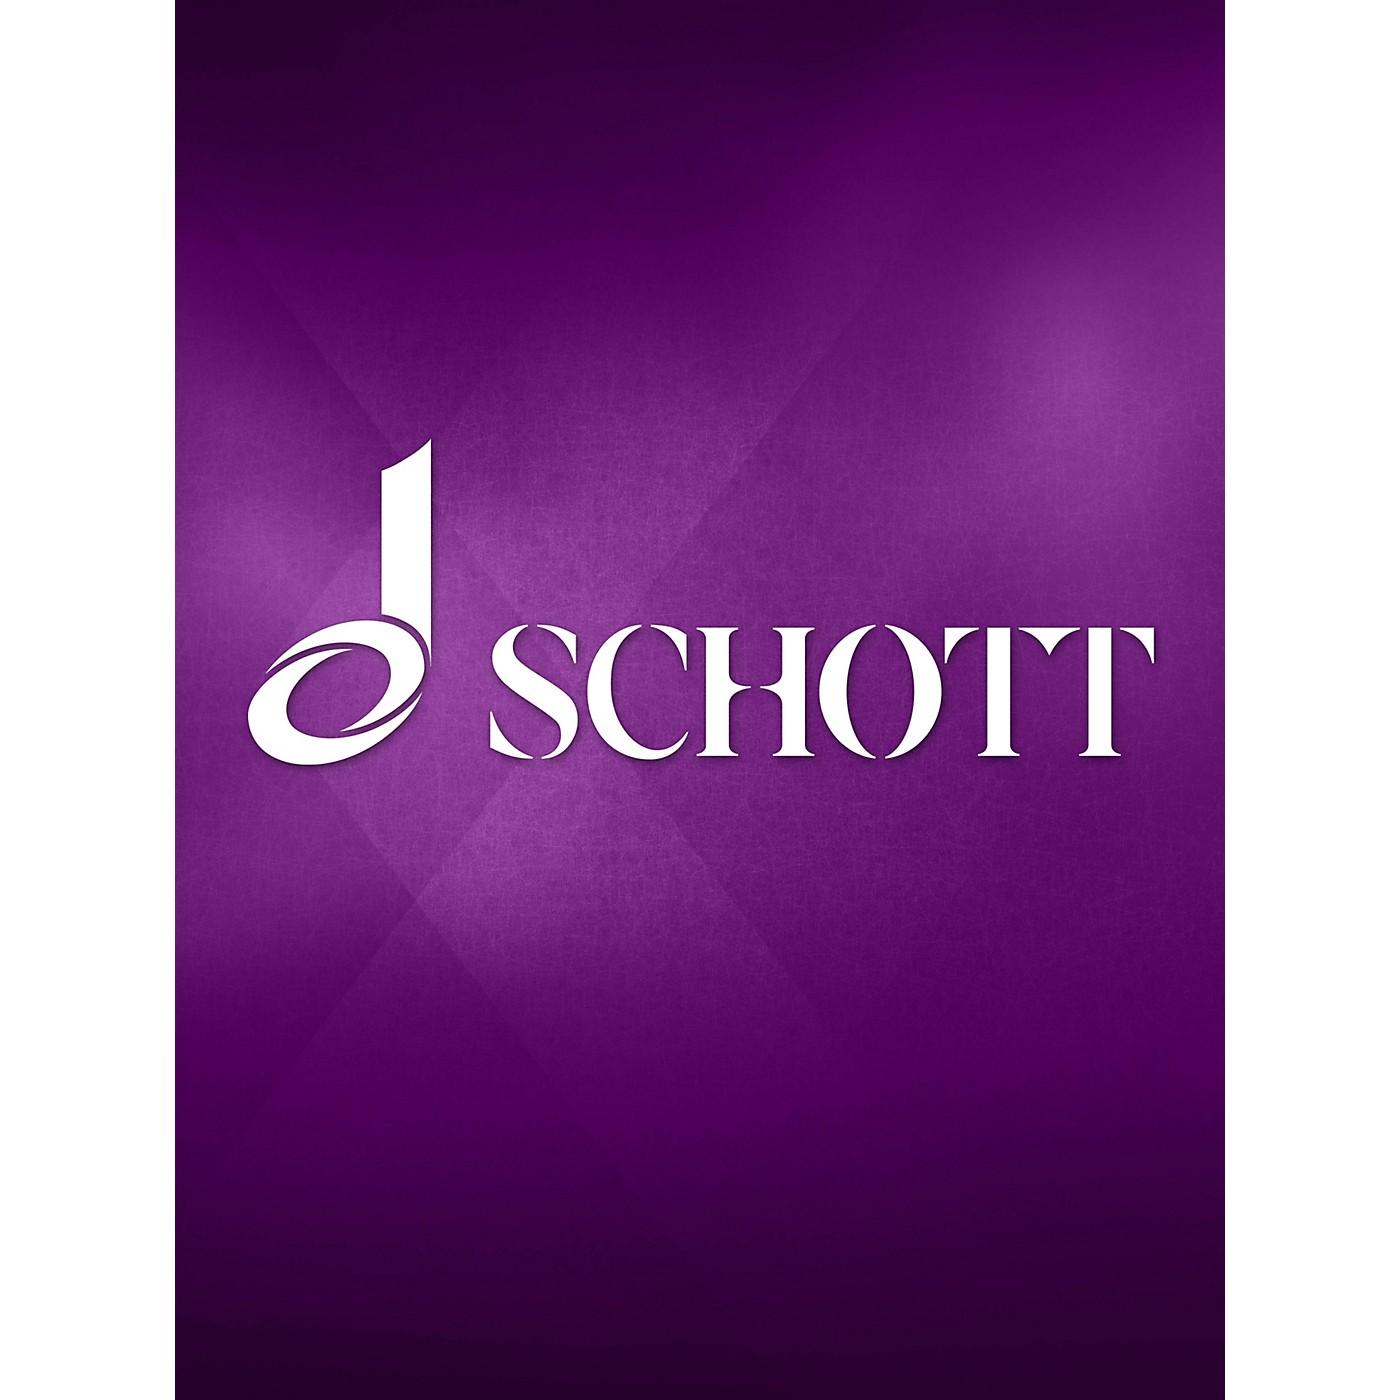 Schott Organ Concerto 8 Op. 7, No. 2 in A Major (Violin 3 Part) Schott Series Composed by Georg Friedrich Händel thumbnail